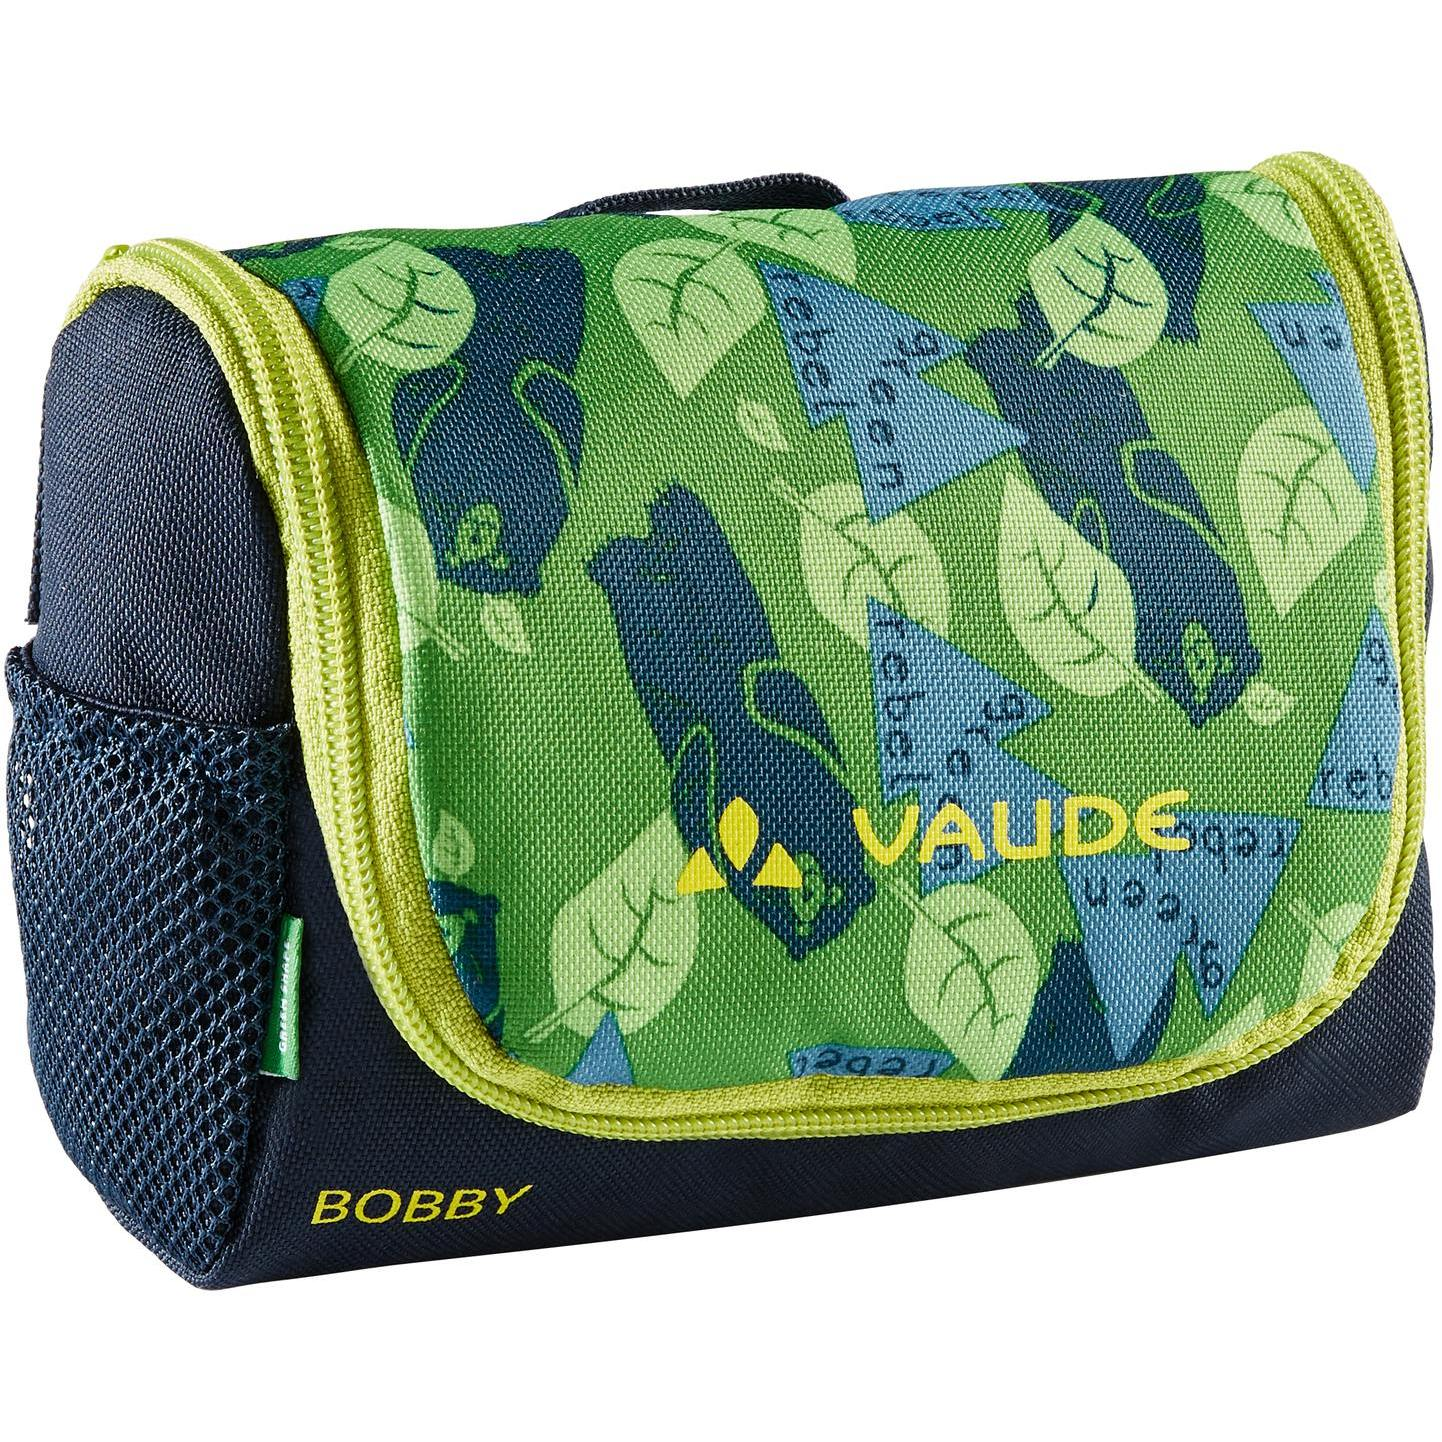 Vaude Bobby Kid's-Washbag - parrot green/eclipse